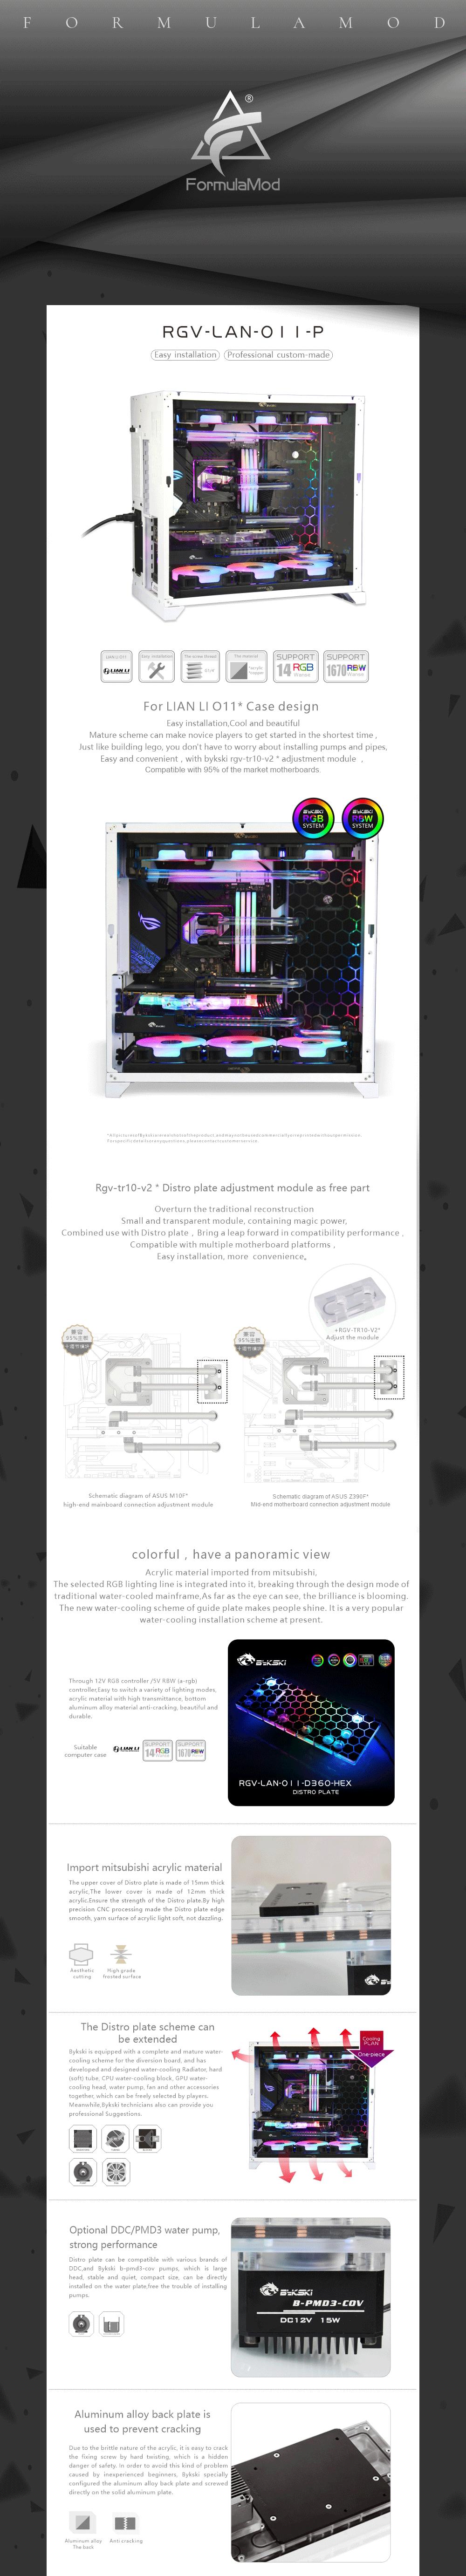 Bykski Waterway Cooling Kit For LIANLI O11 Case, 5V ARGB, For Single GPU Building, RGV-LAN-O11-D360-HEX